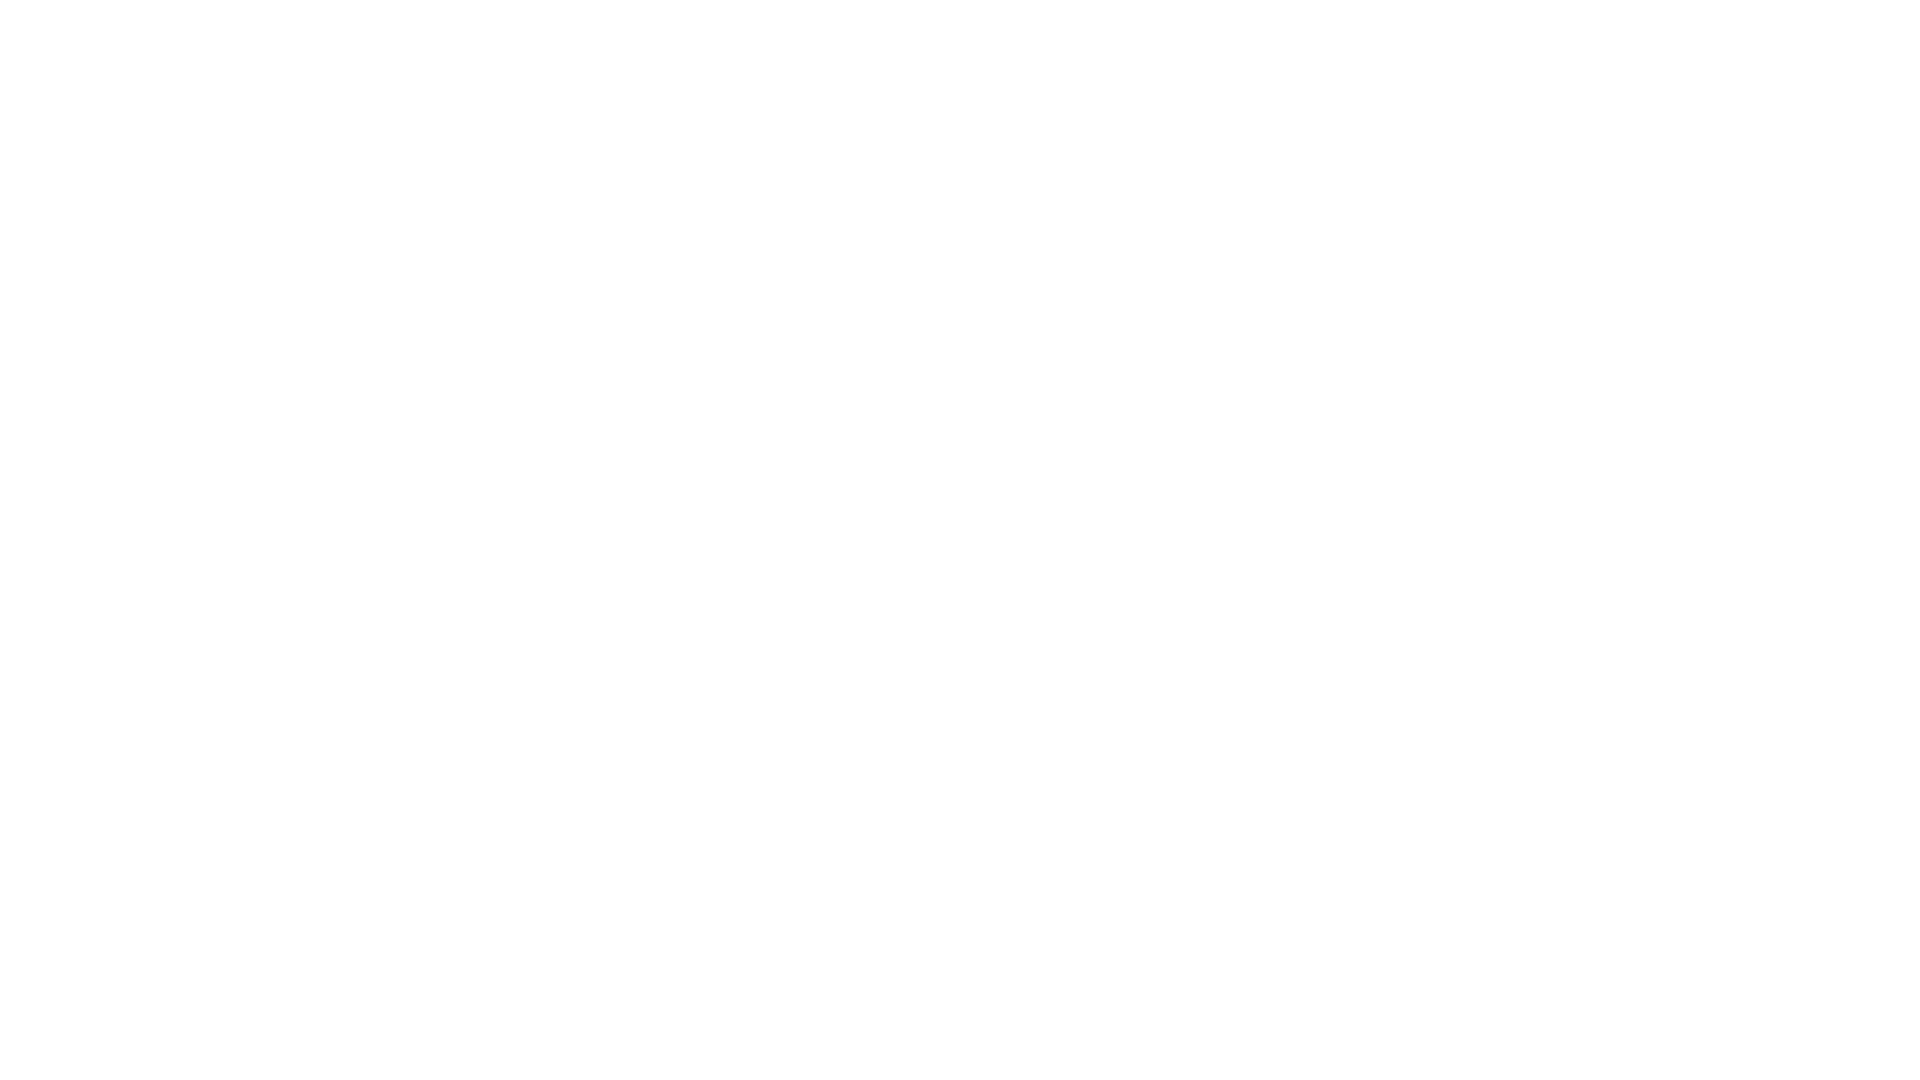 REMCOSMITS.NL